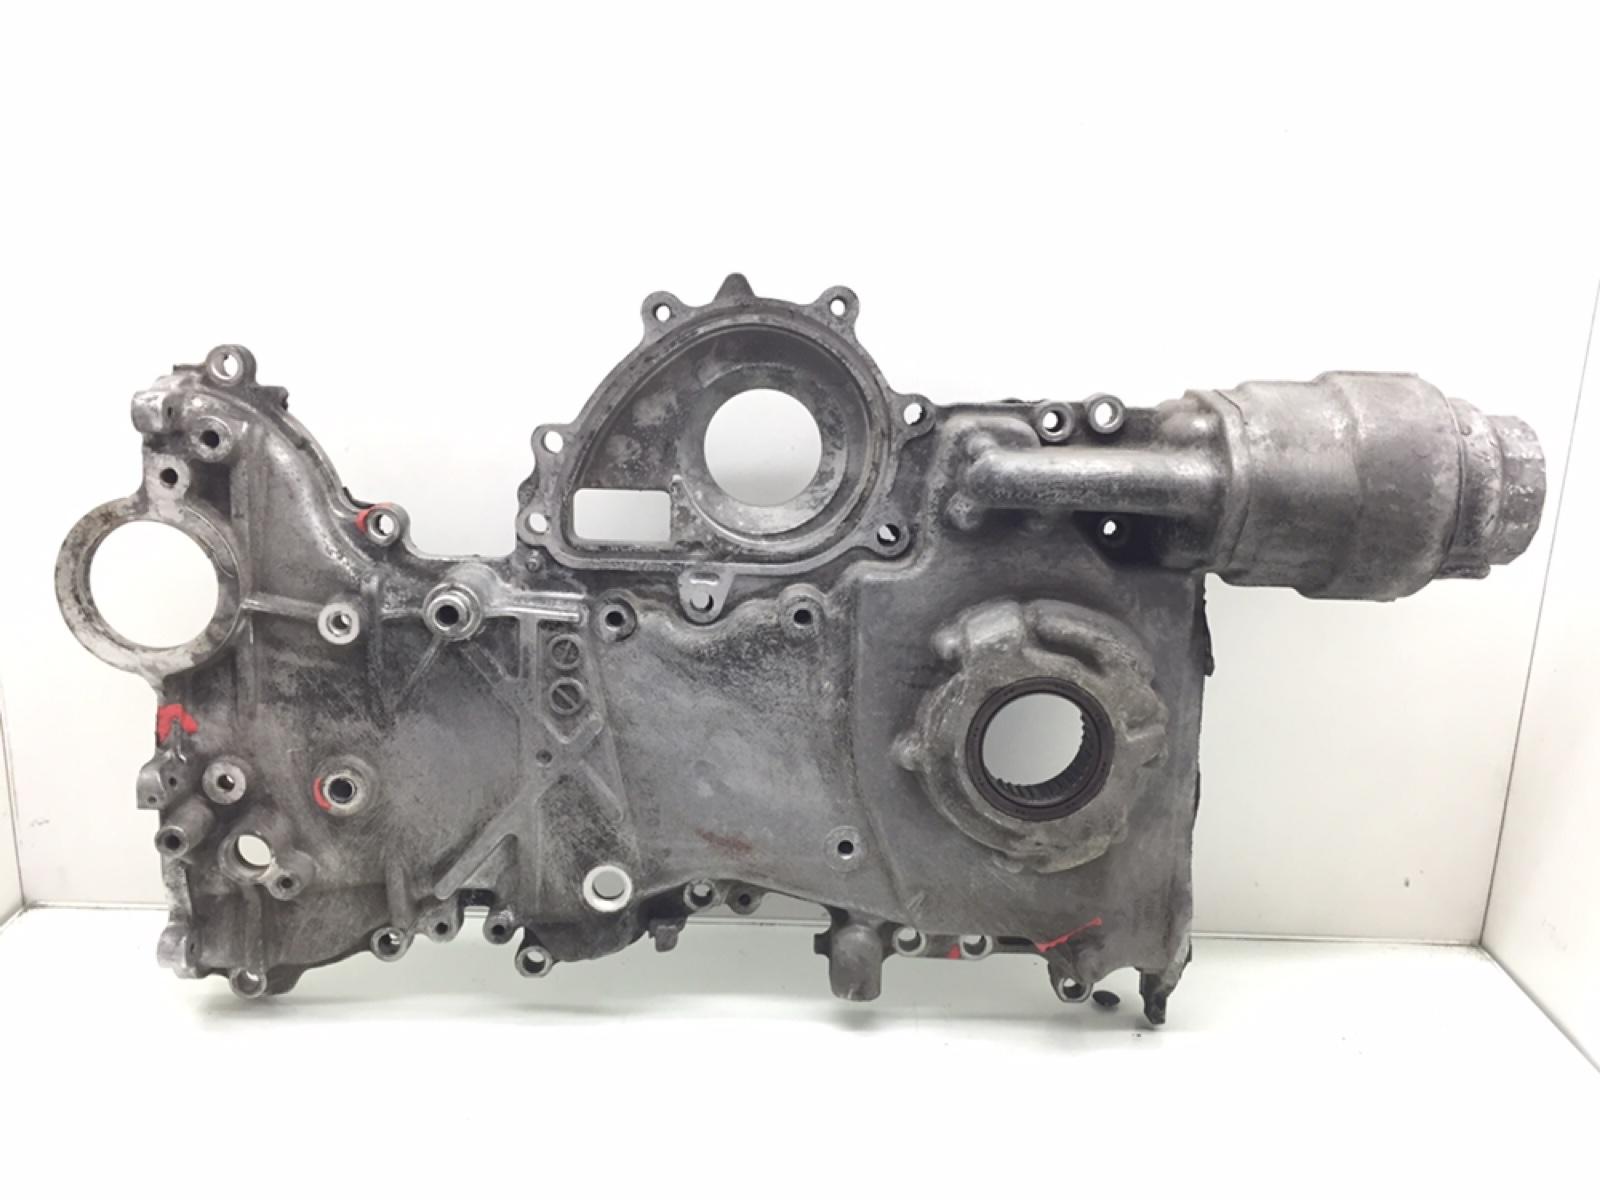 Крышка двигателя передняя Toyota Avensis 2.2 D-4D 2006 (б/у)